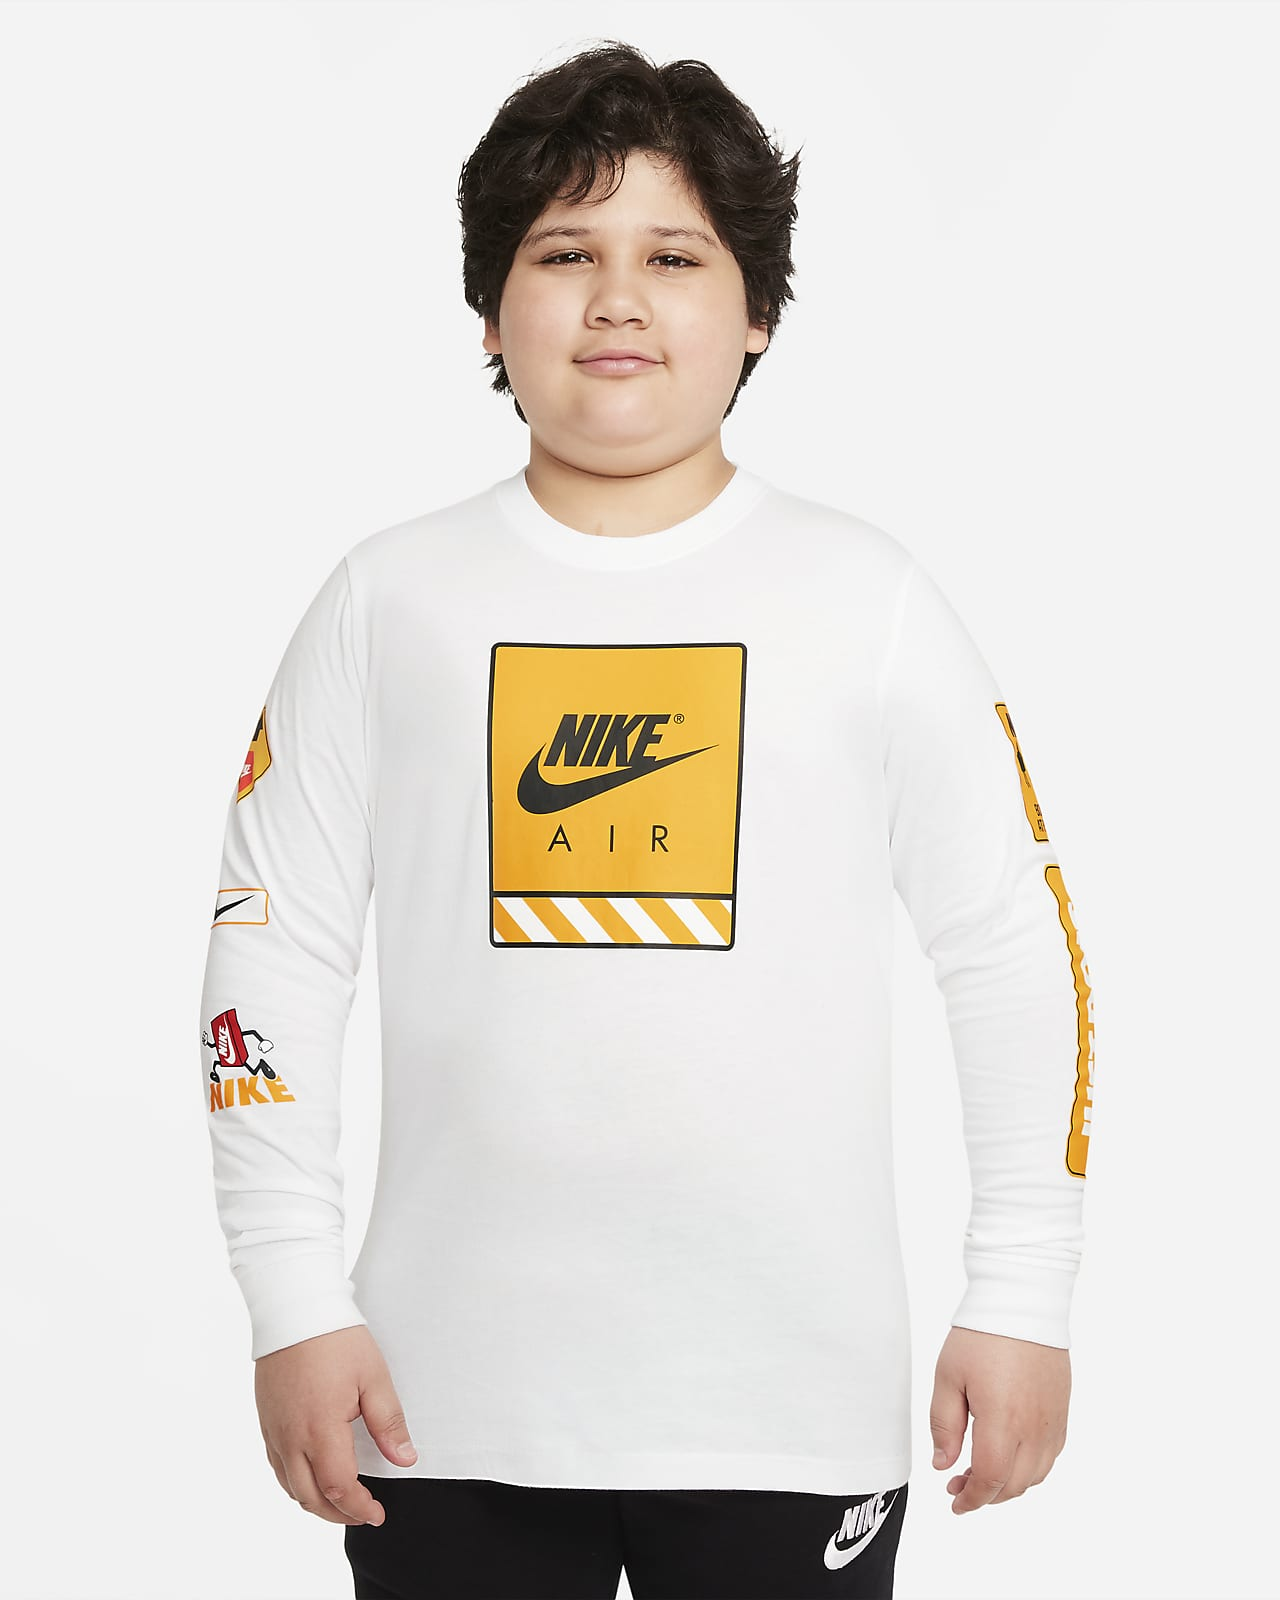 Playera de manga larga para niños talla grande (talla extendida) Nike Sportswear